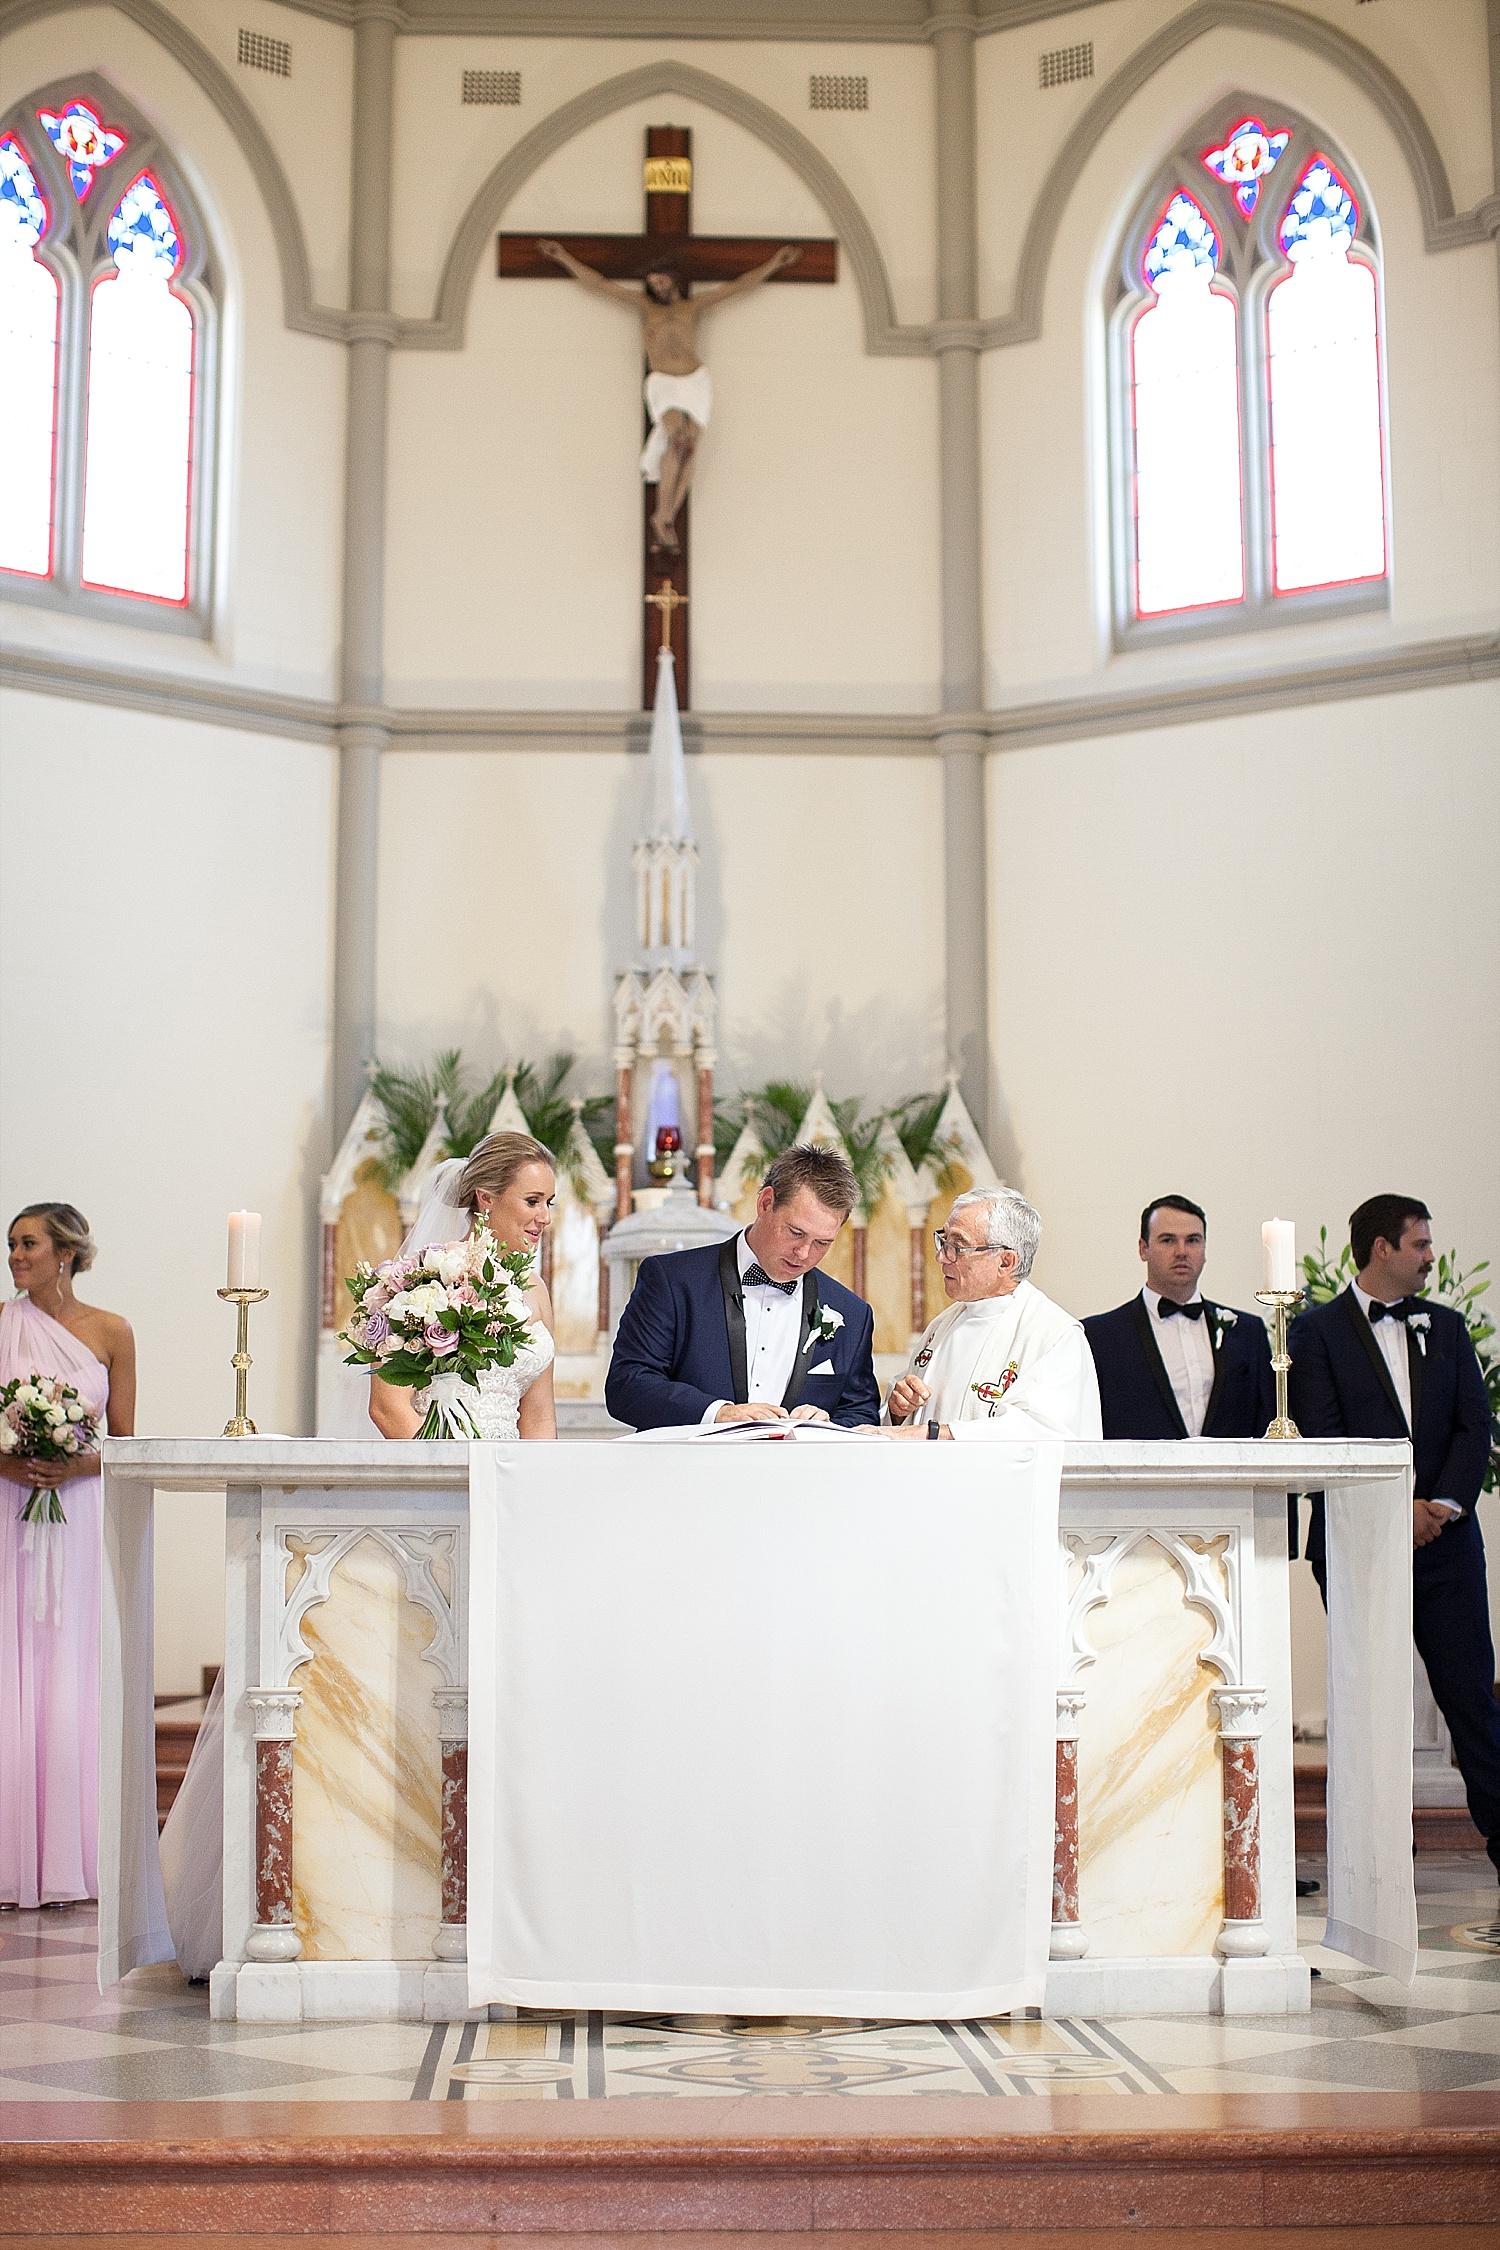 St_Josephs_Church_Subiaco_Wedding_0157.jpg